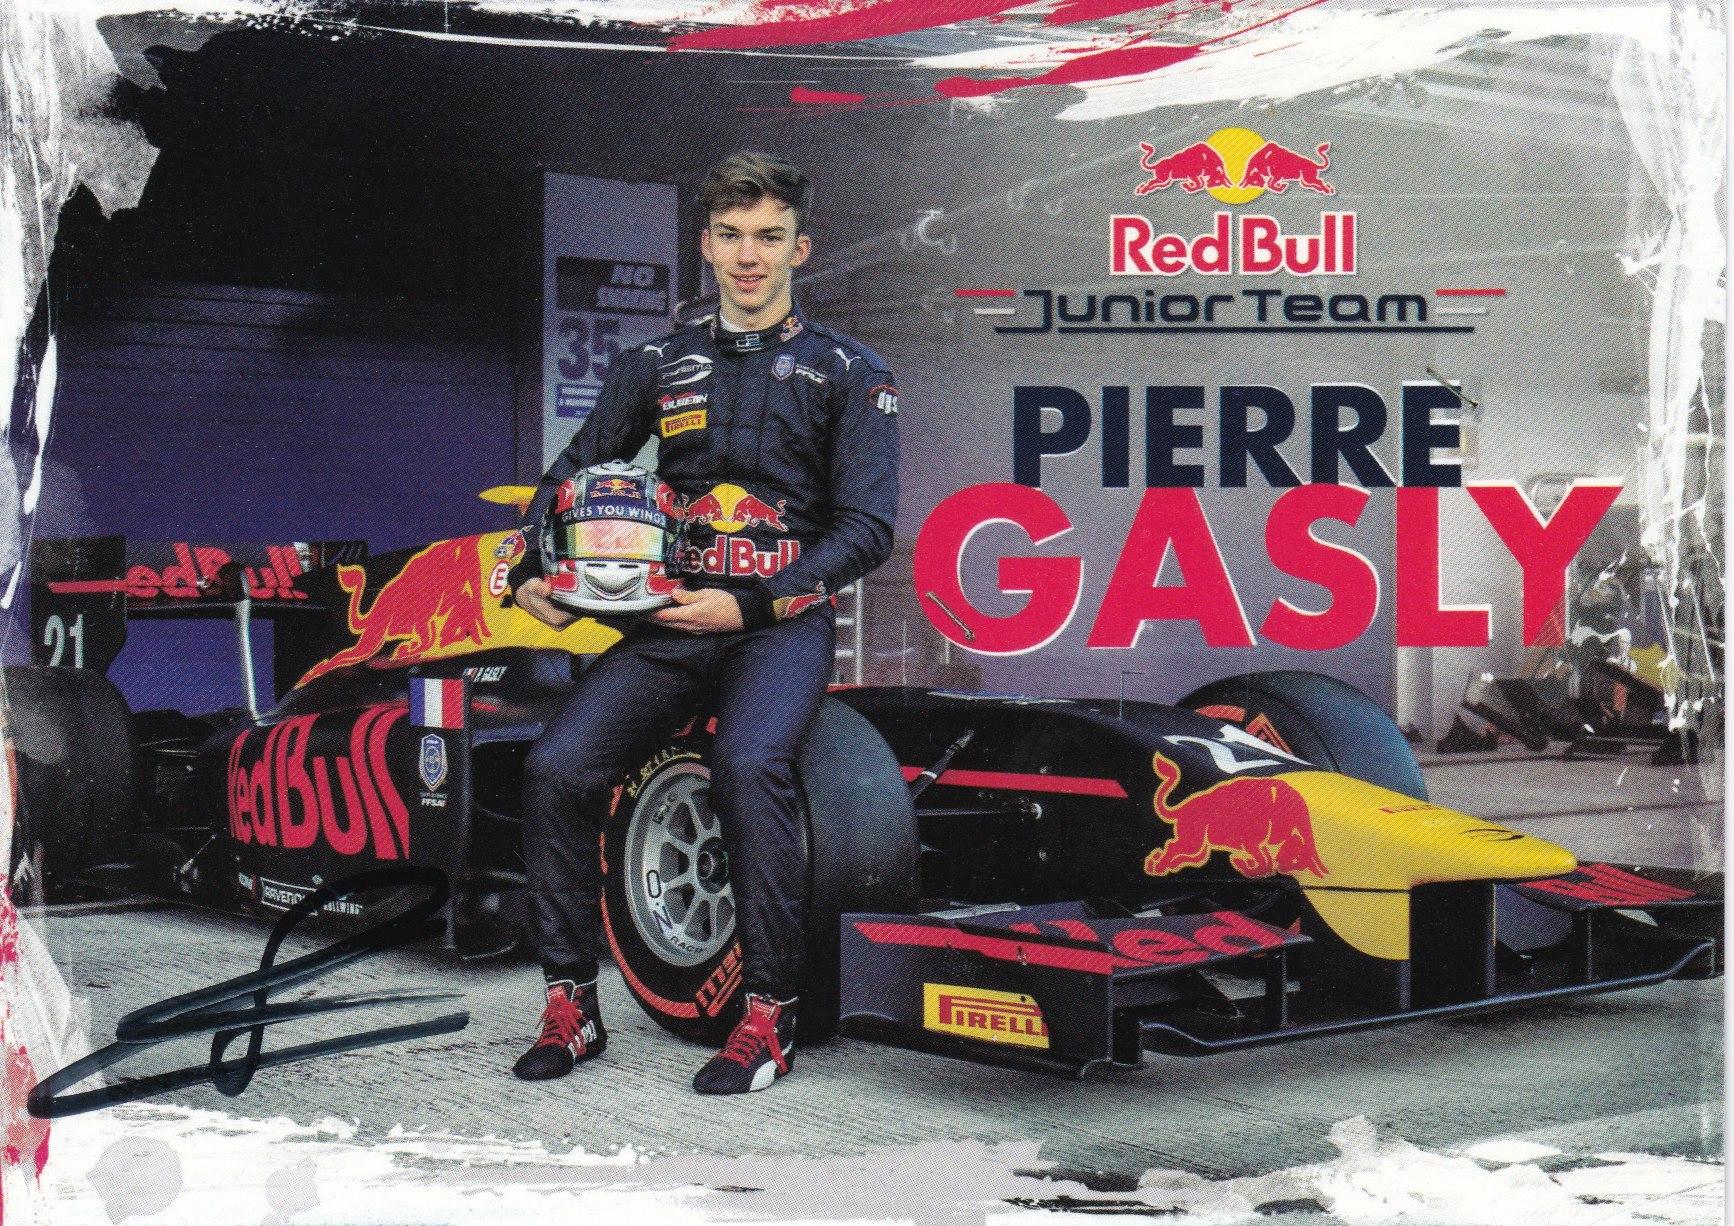 Pierre Gasly Red Bull Junior Team 2016